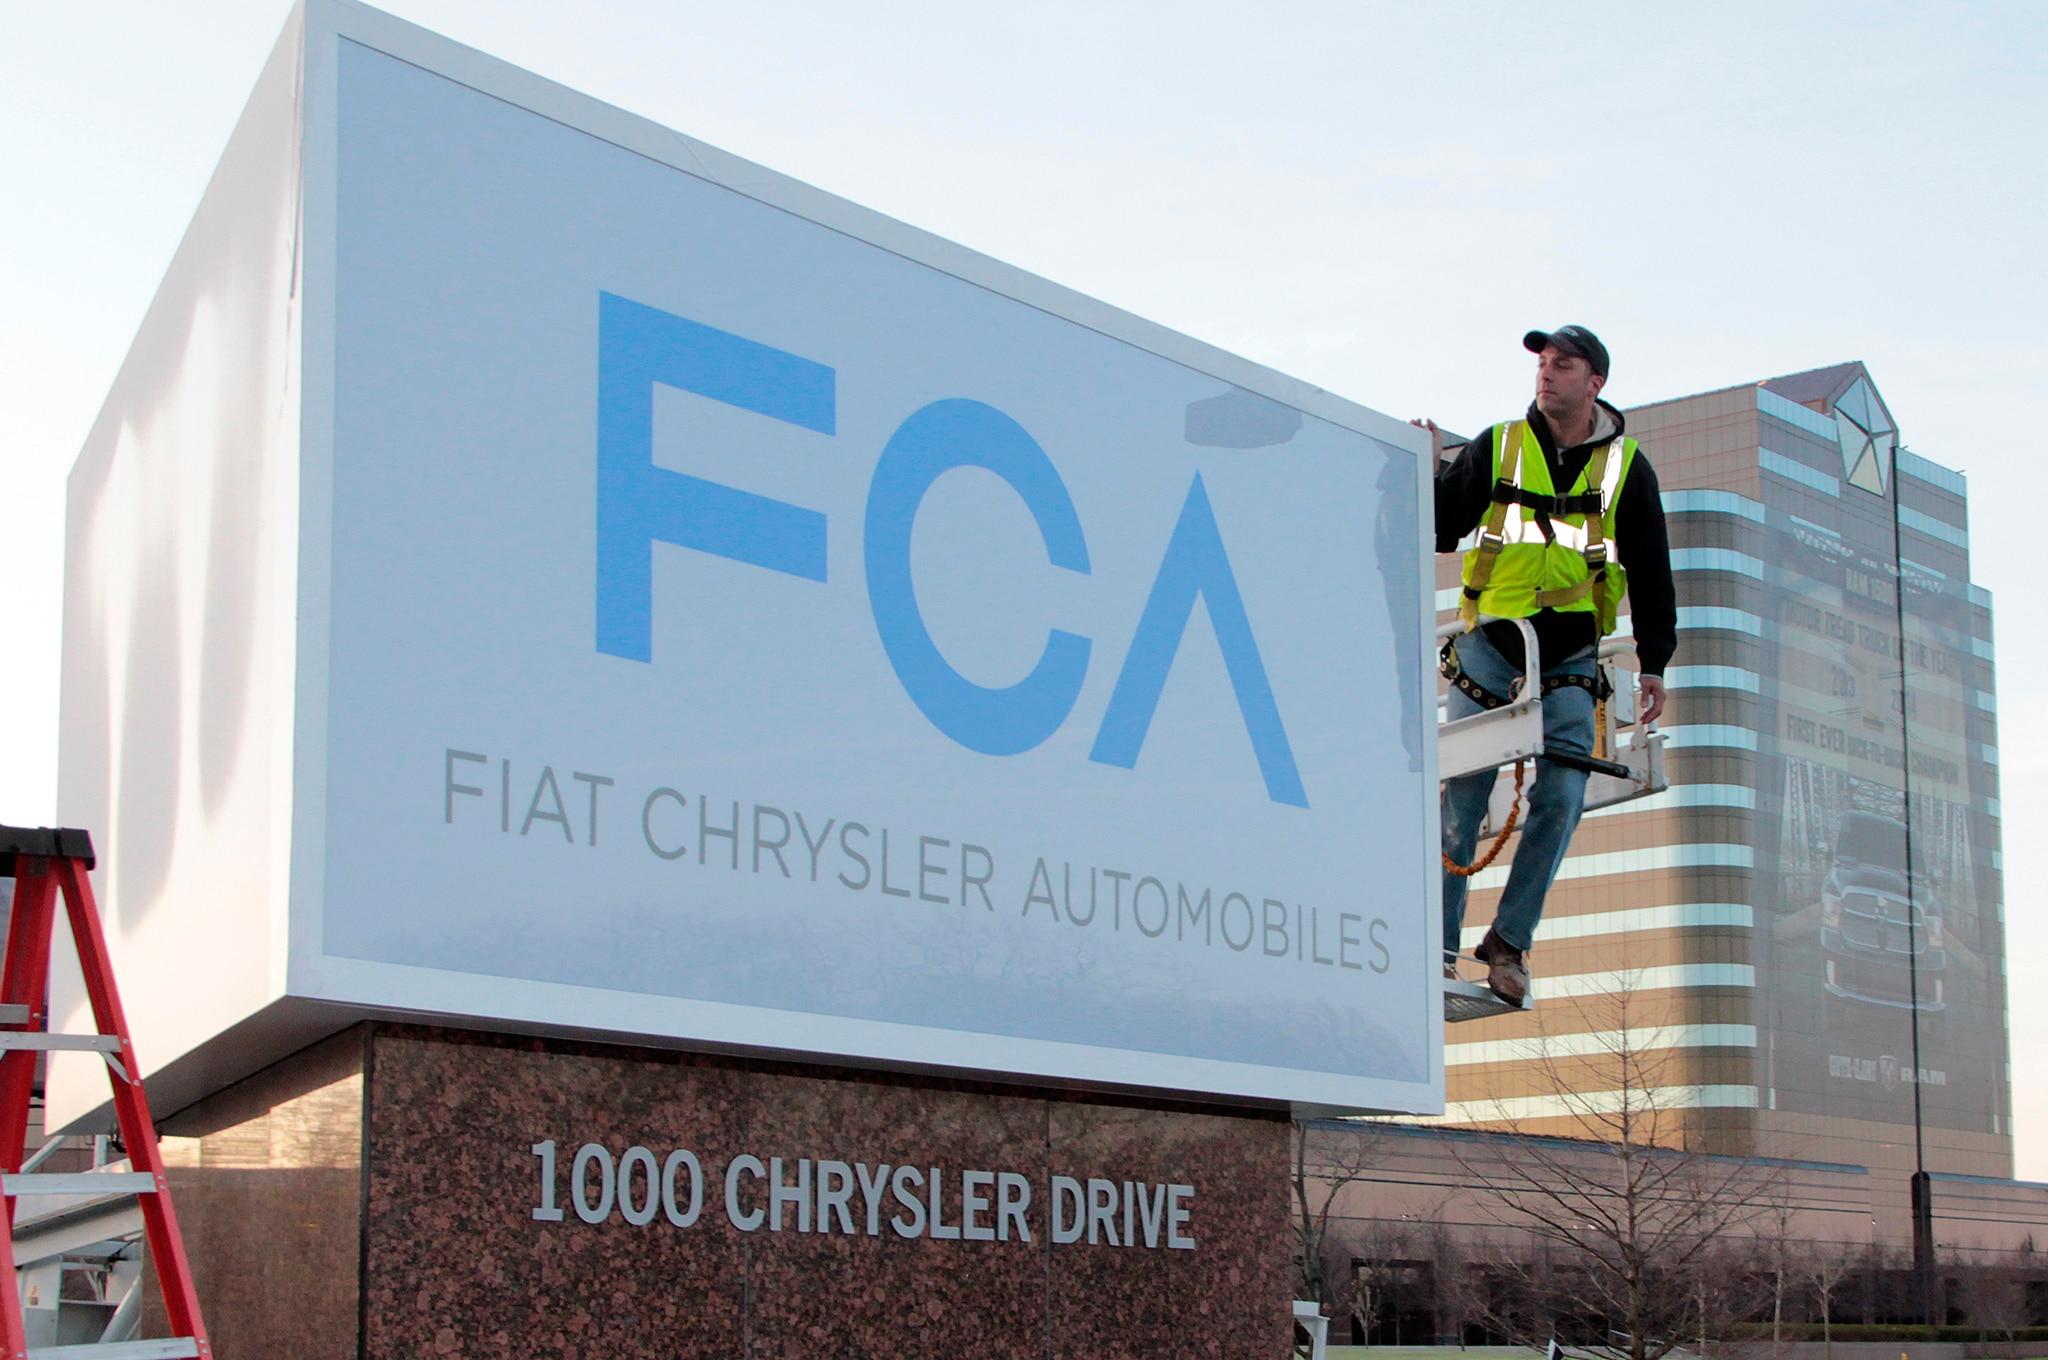 Fiat Chrysler Automobiles New Sign Construction 4